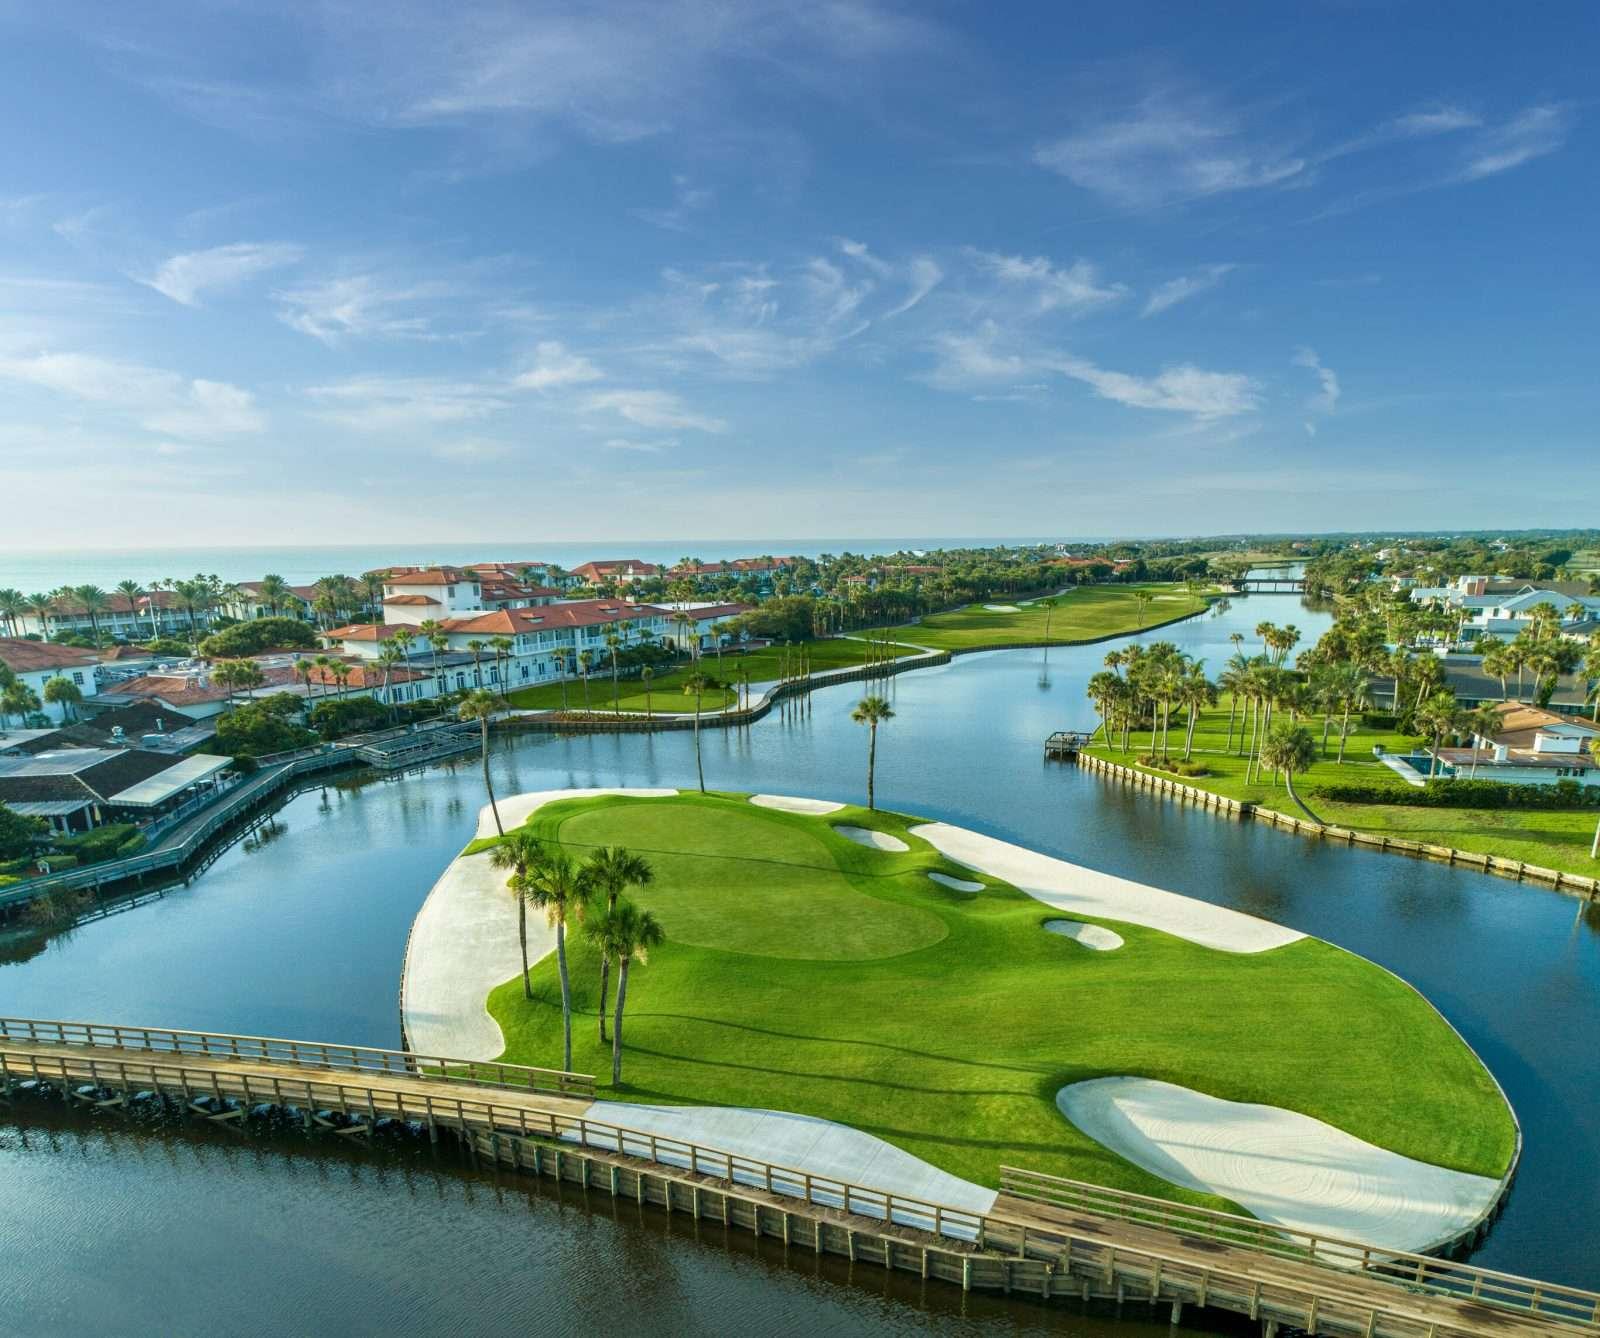 Ponte Vedra Inn & Club aerial shot of golf course